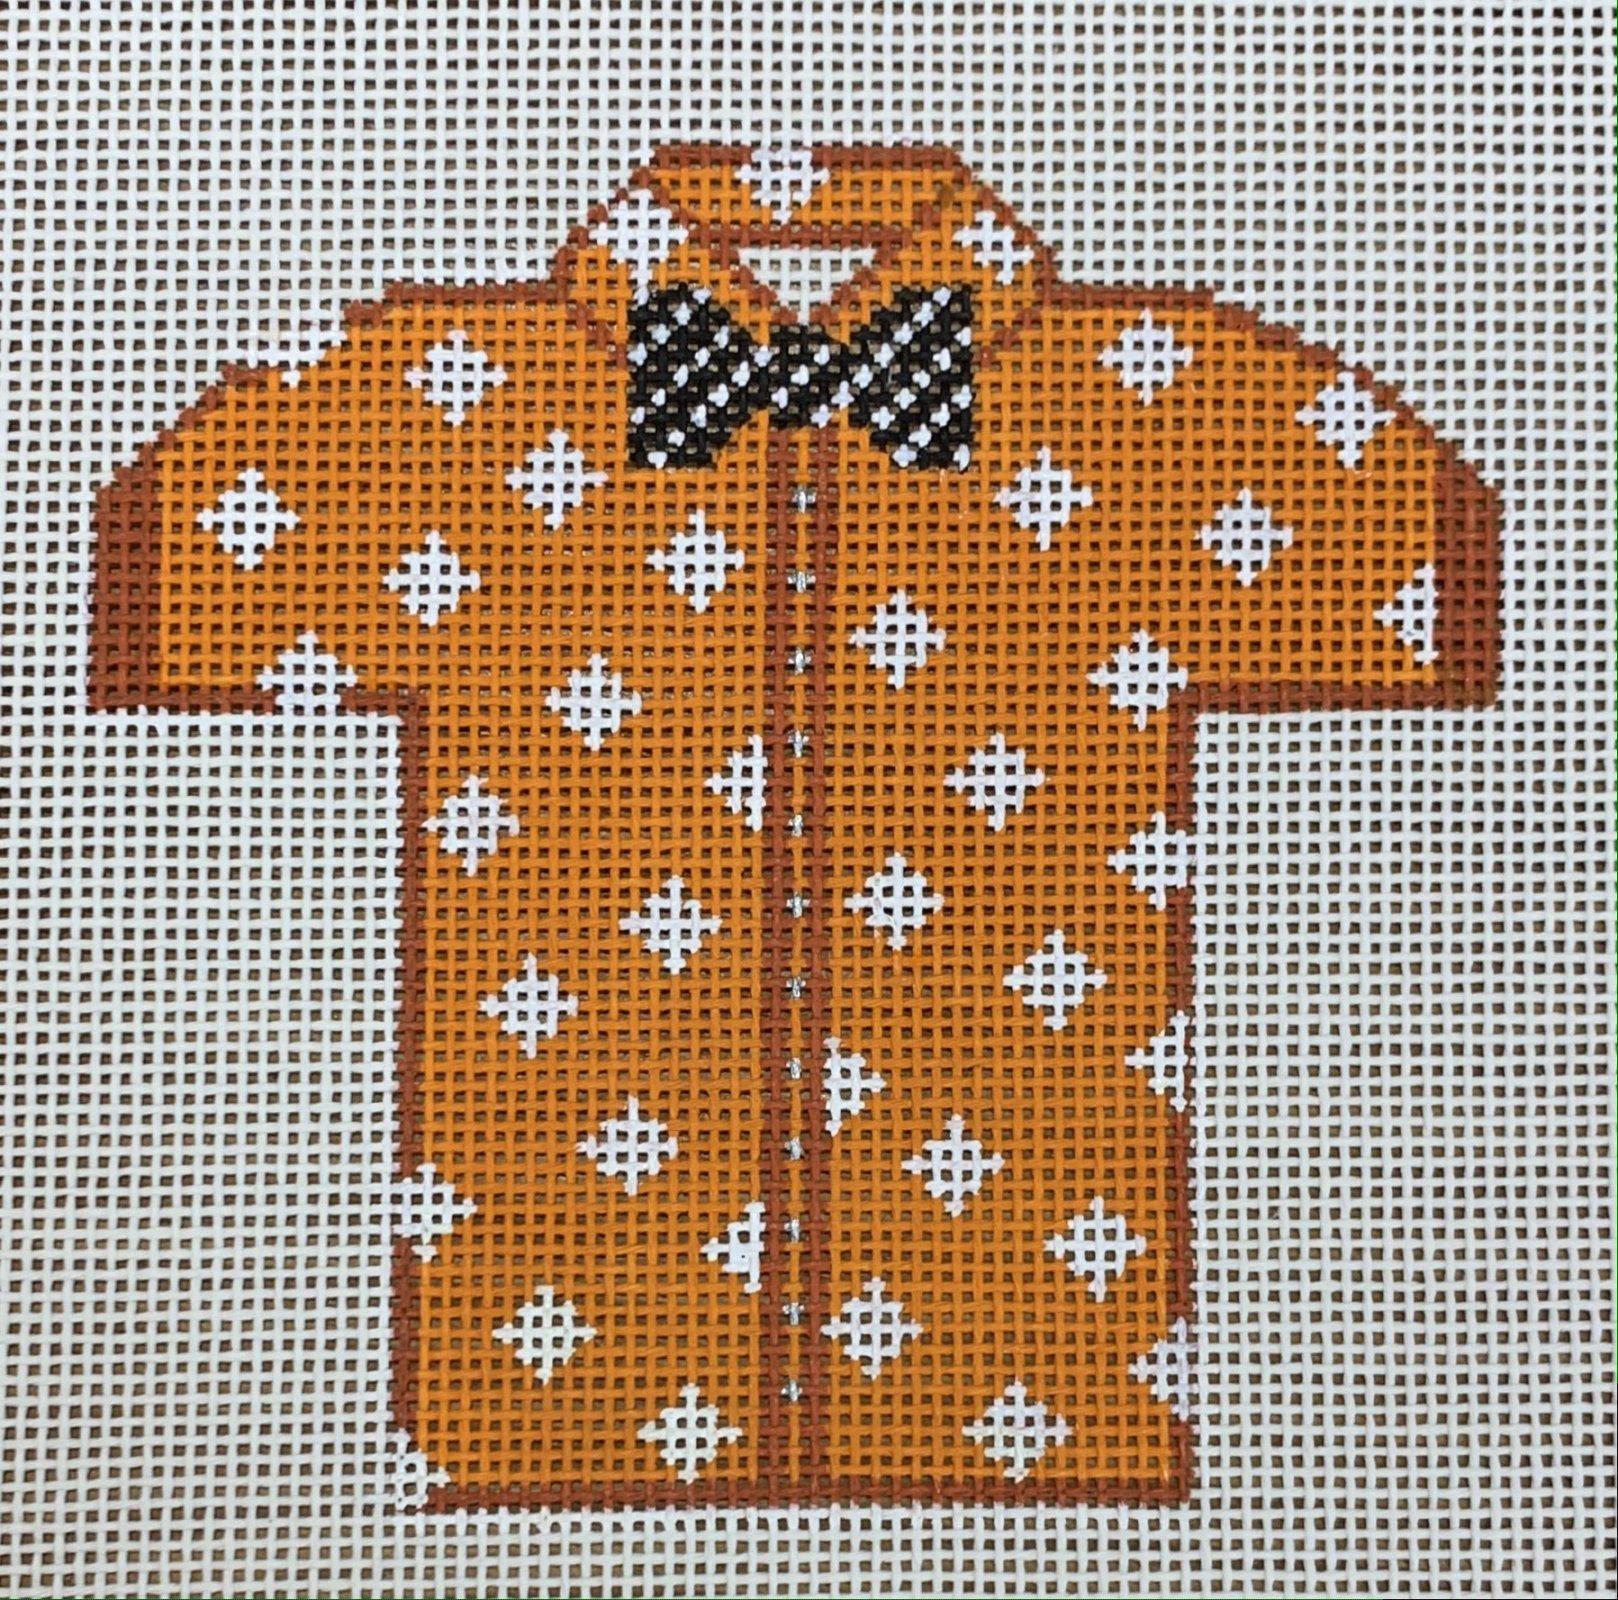 Men's Shirt - Orange with Diamonds